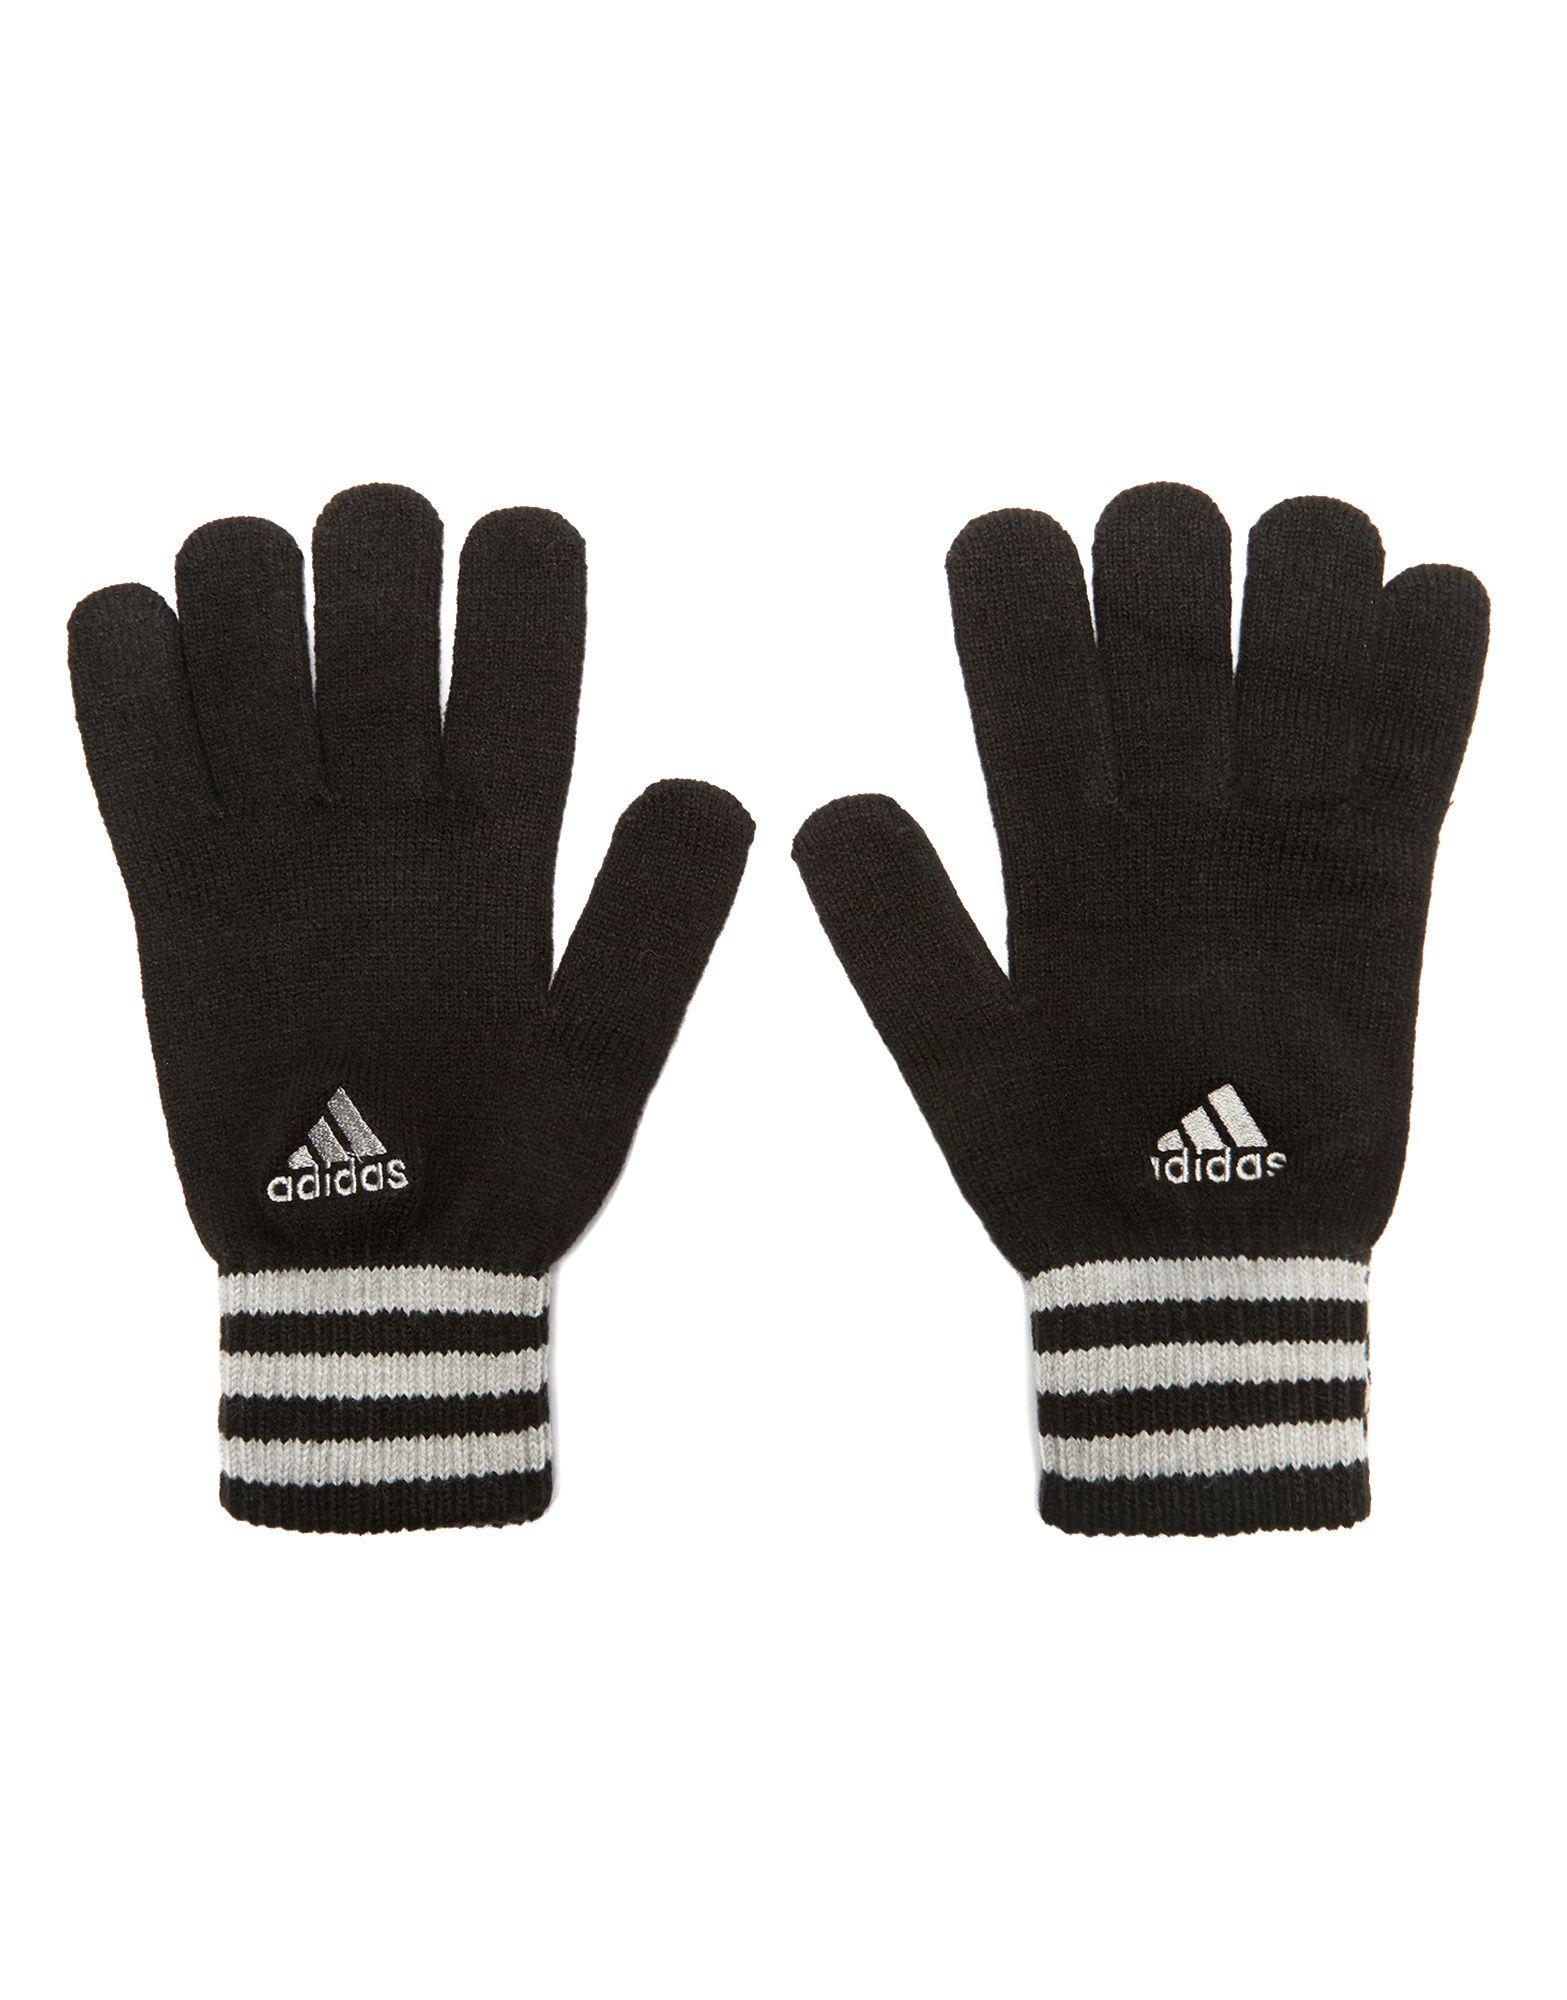 Leather gloves mens jd - Adidas Essential 3 Stripe Gloves